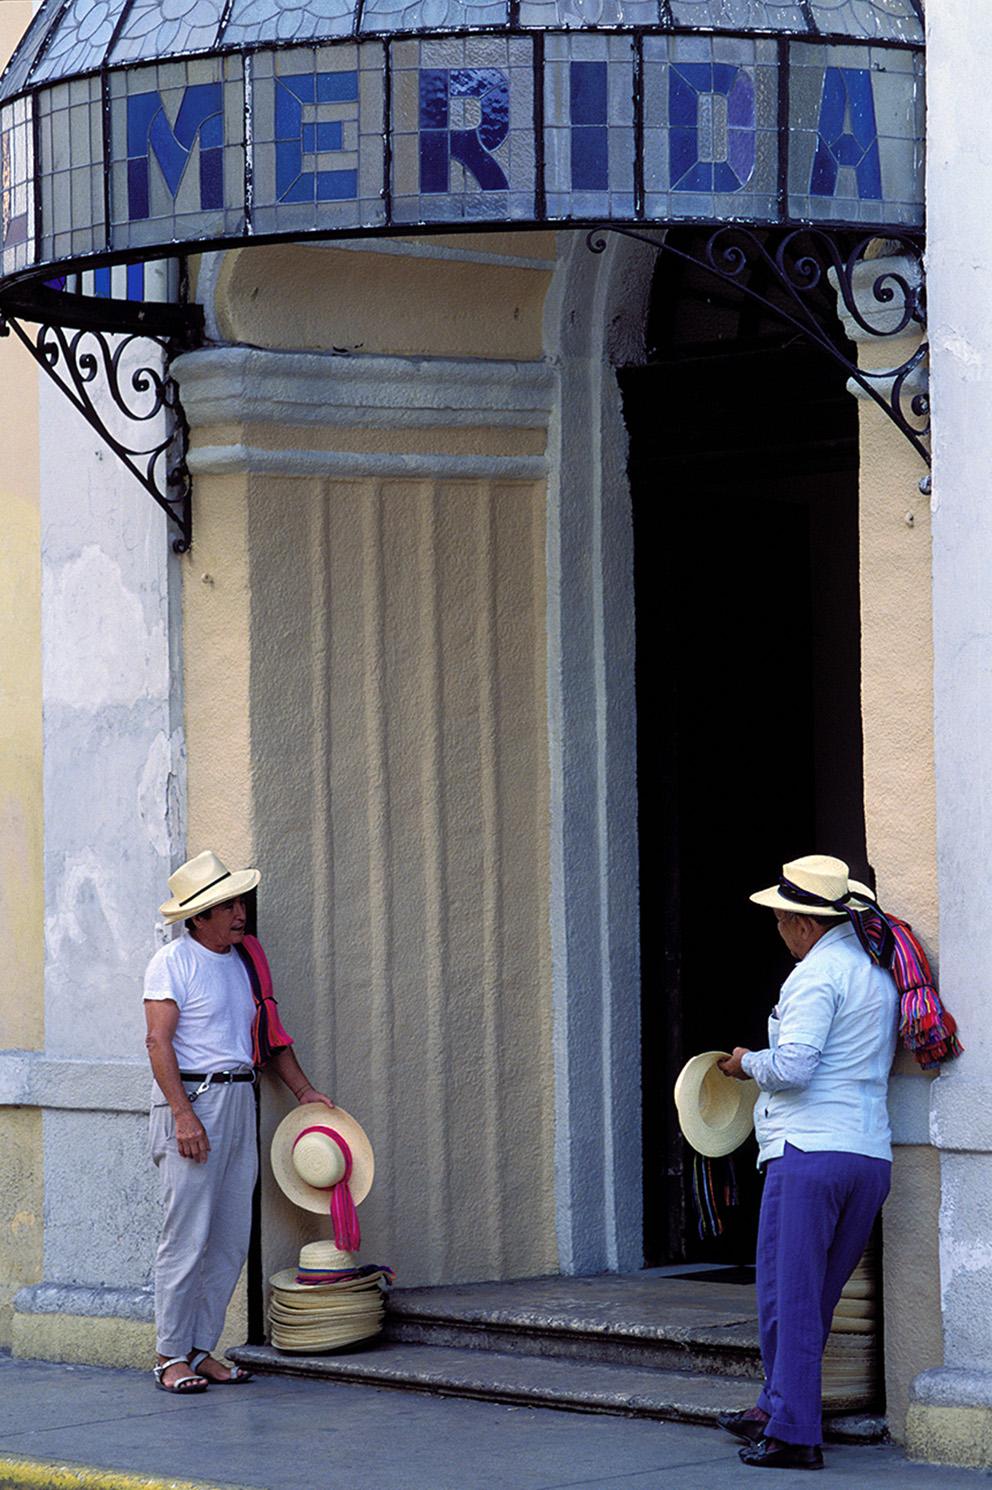 Mexico, Yucatan state, Merida